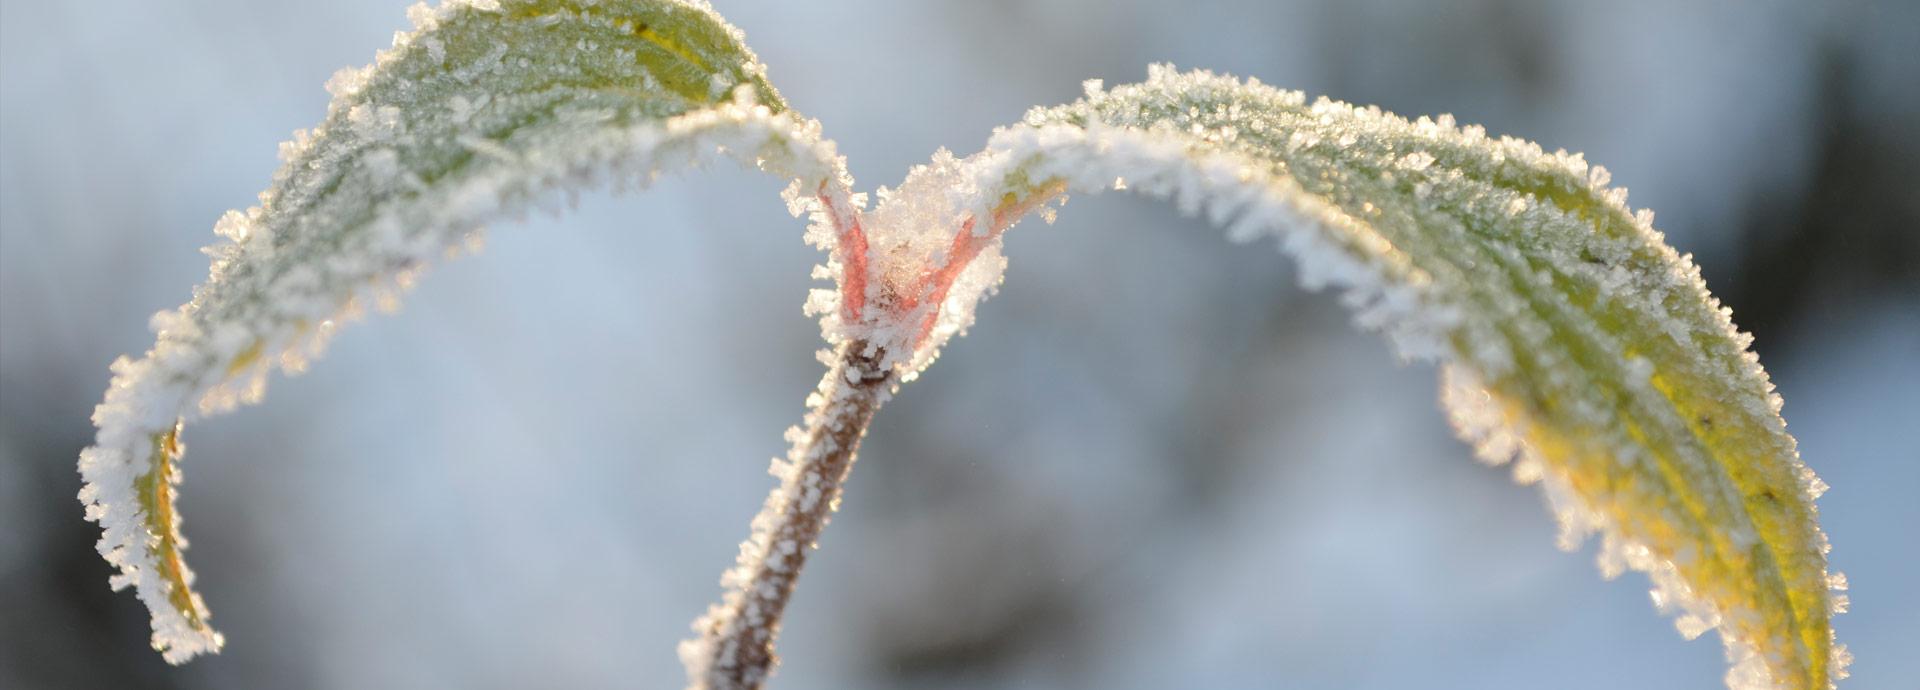 2 Winter